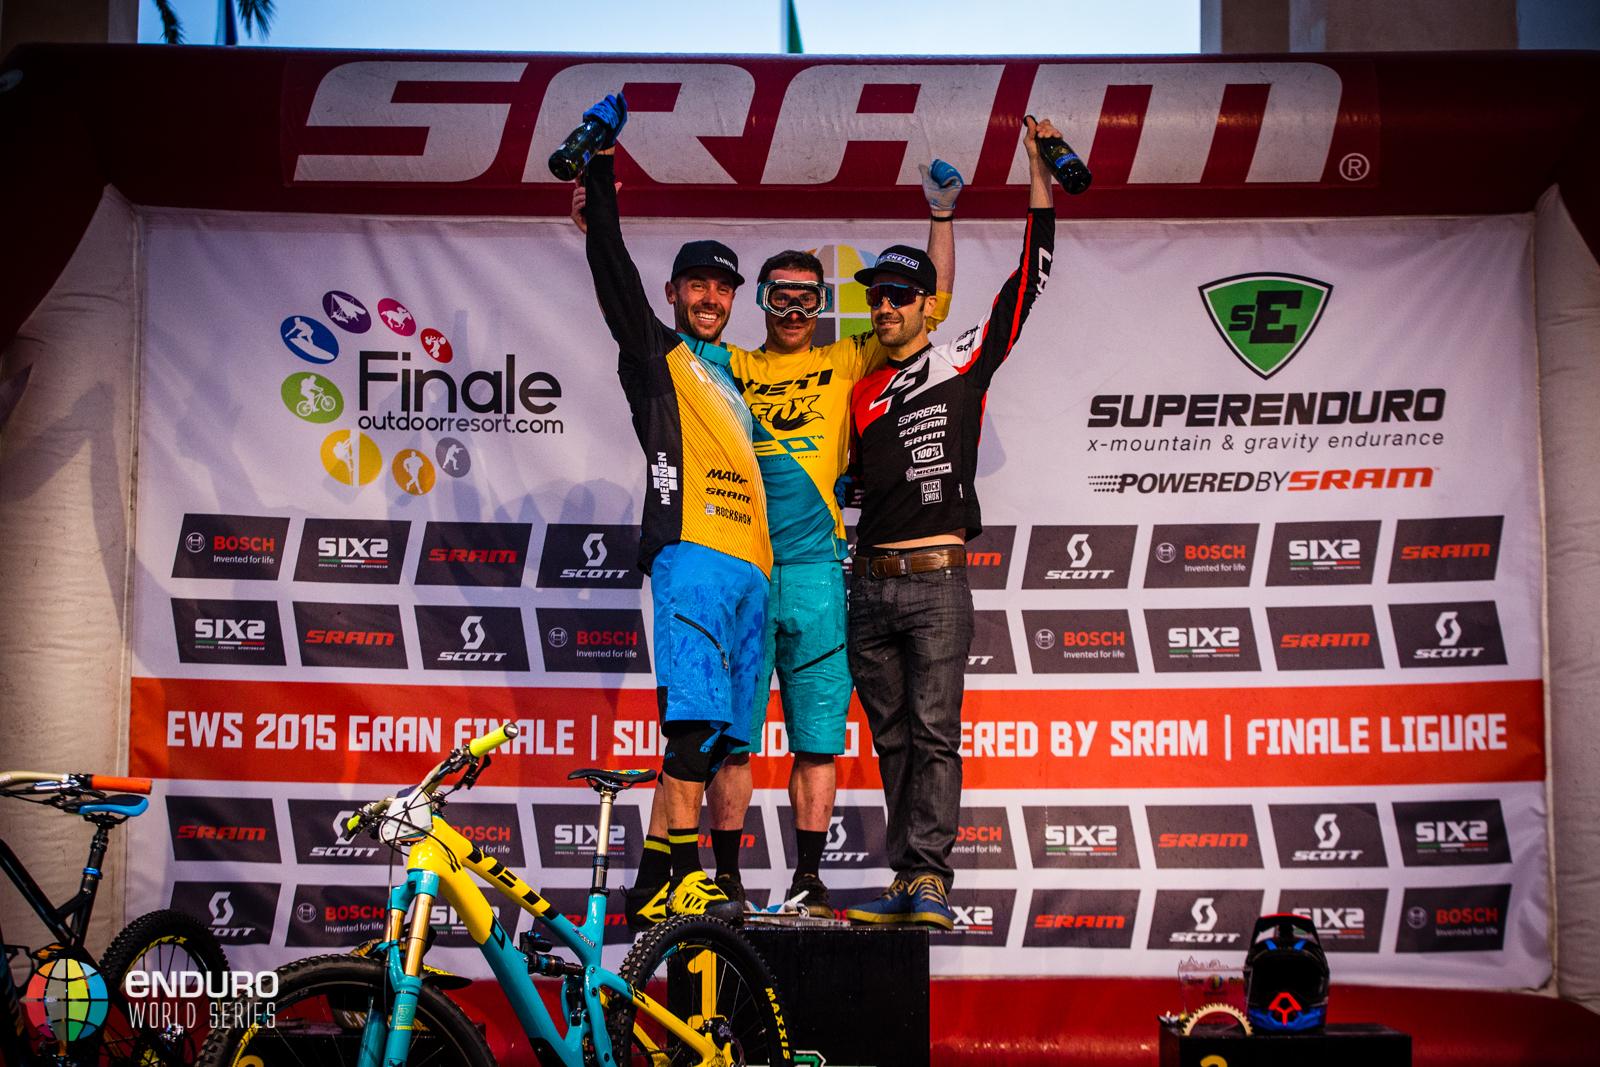 Mens podium. EWS round 8, Finale Ligure, Italy. Photo by Matt Wragg.